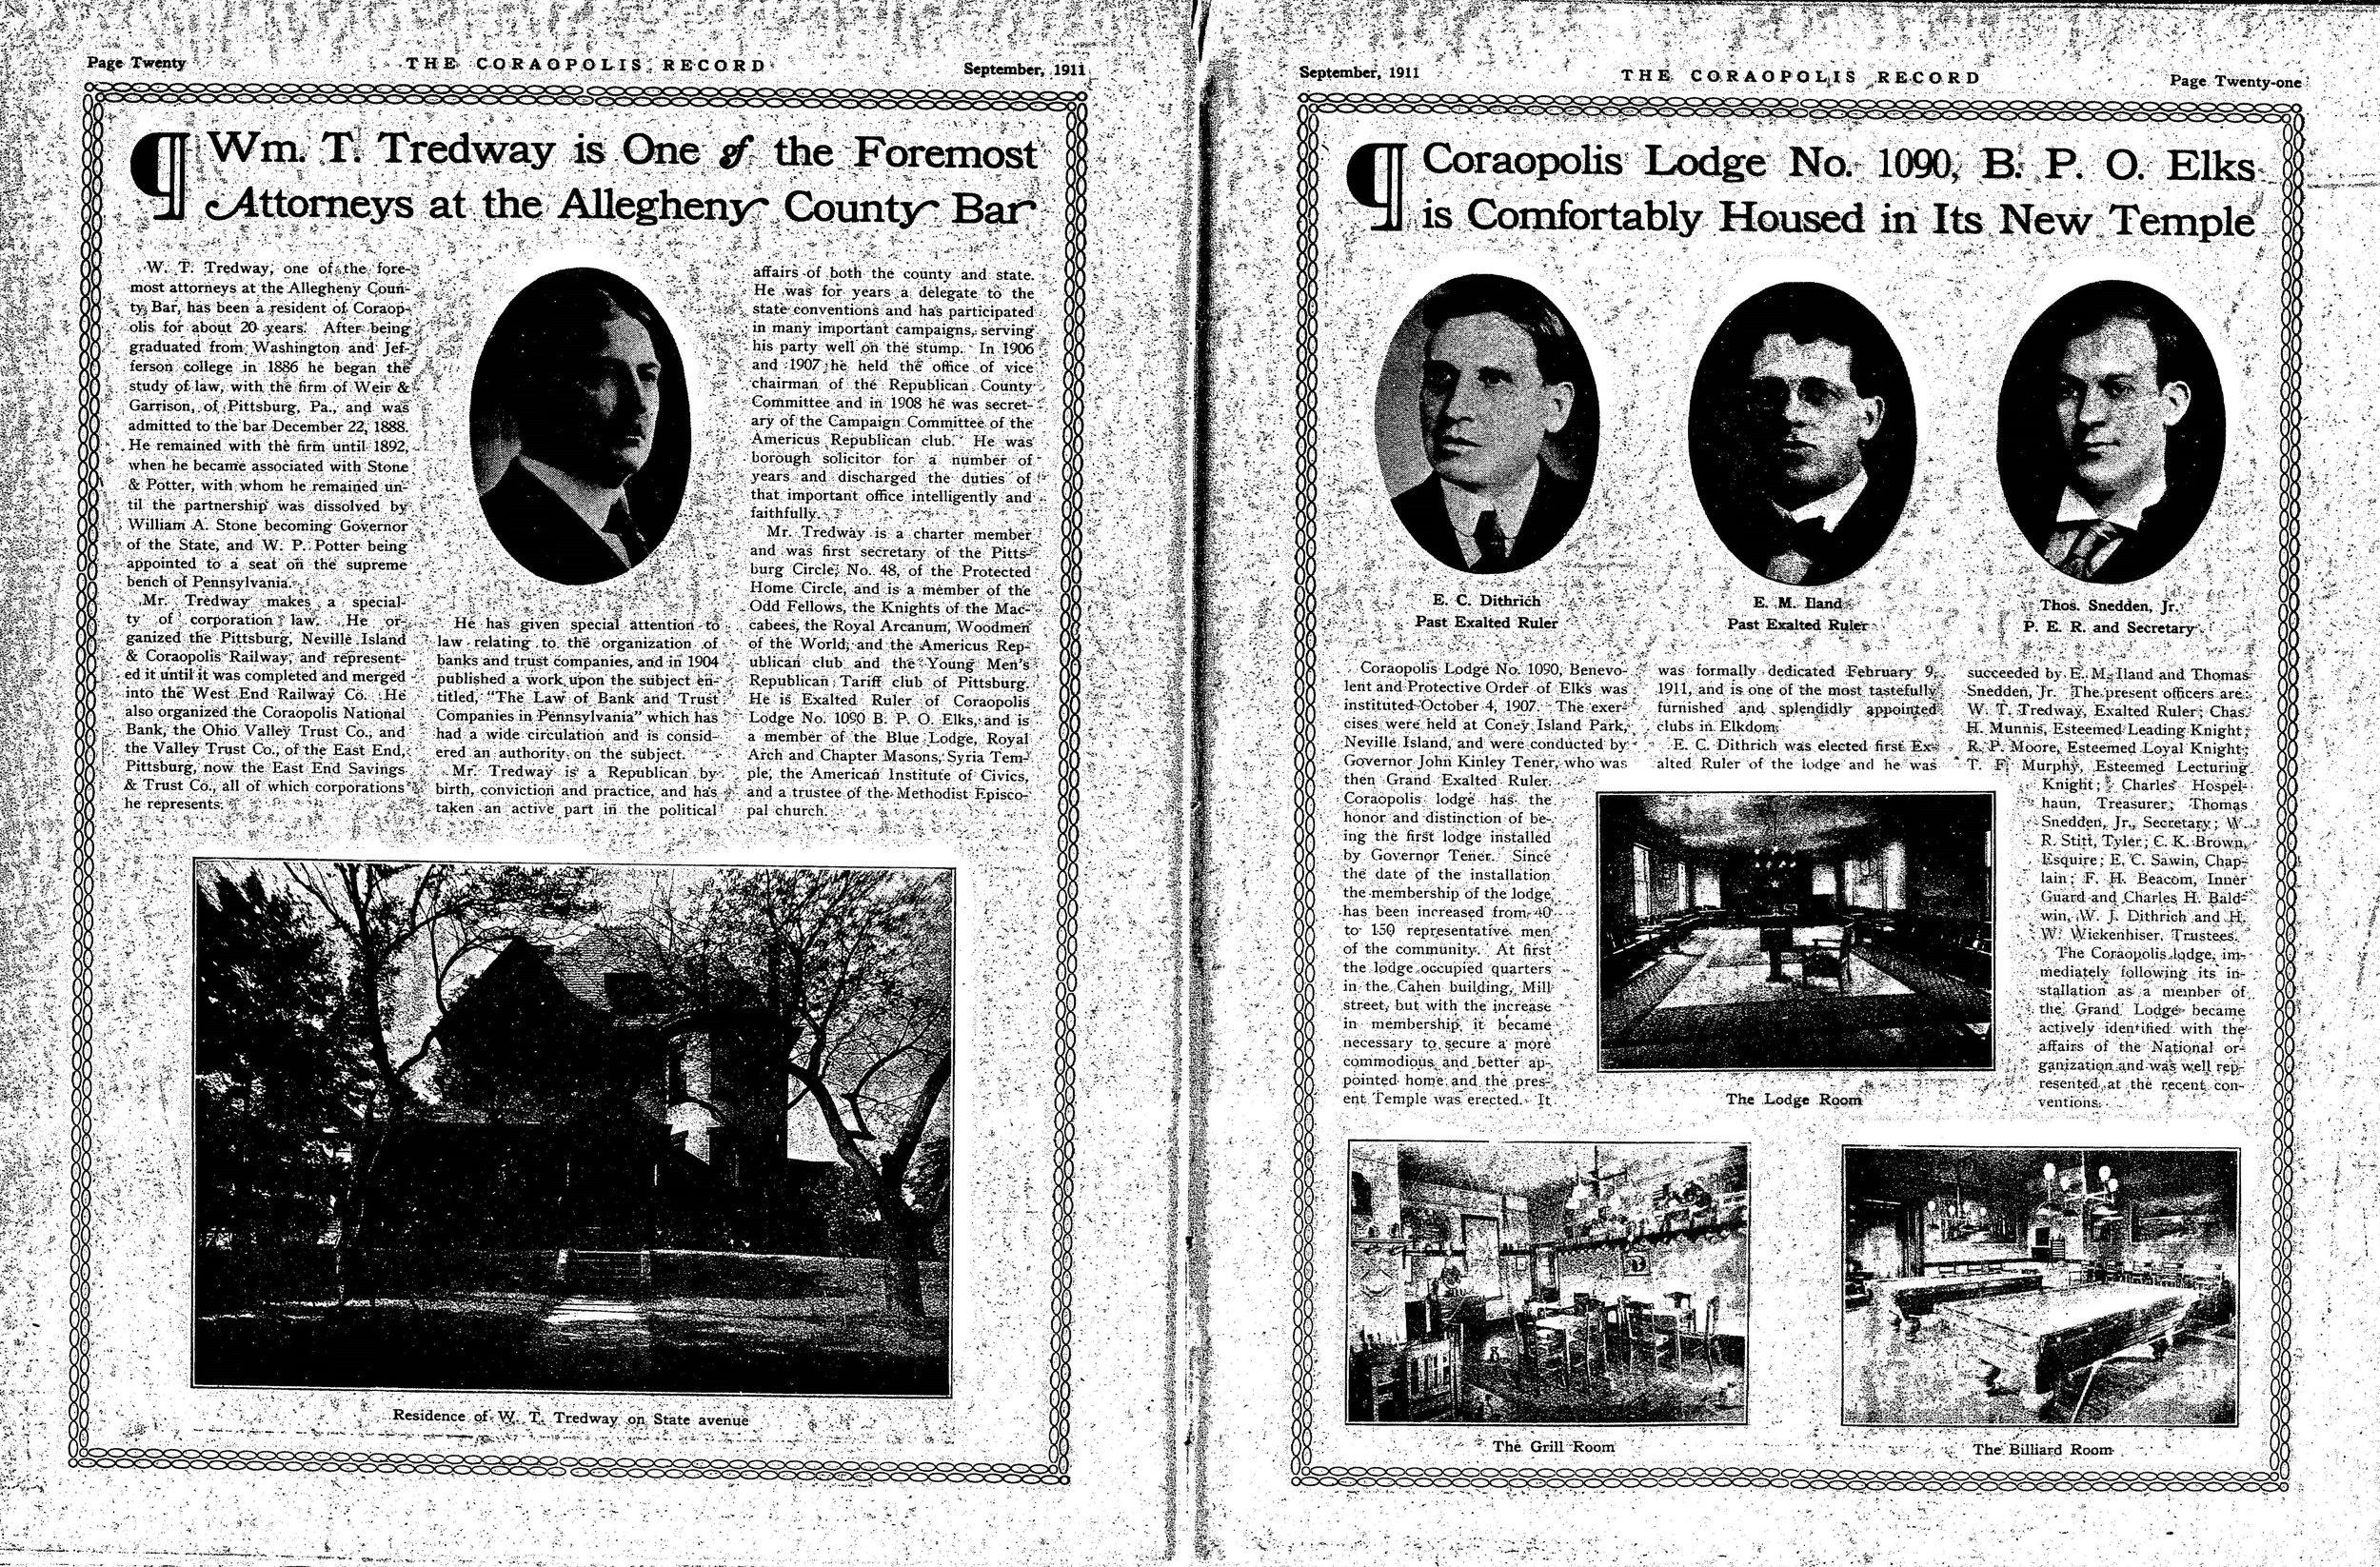 1911-09-15 The Coraopolis Record_Page_13.jpg